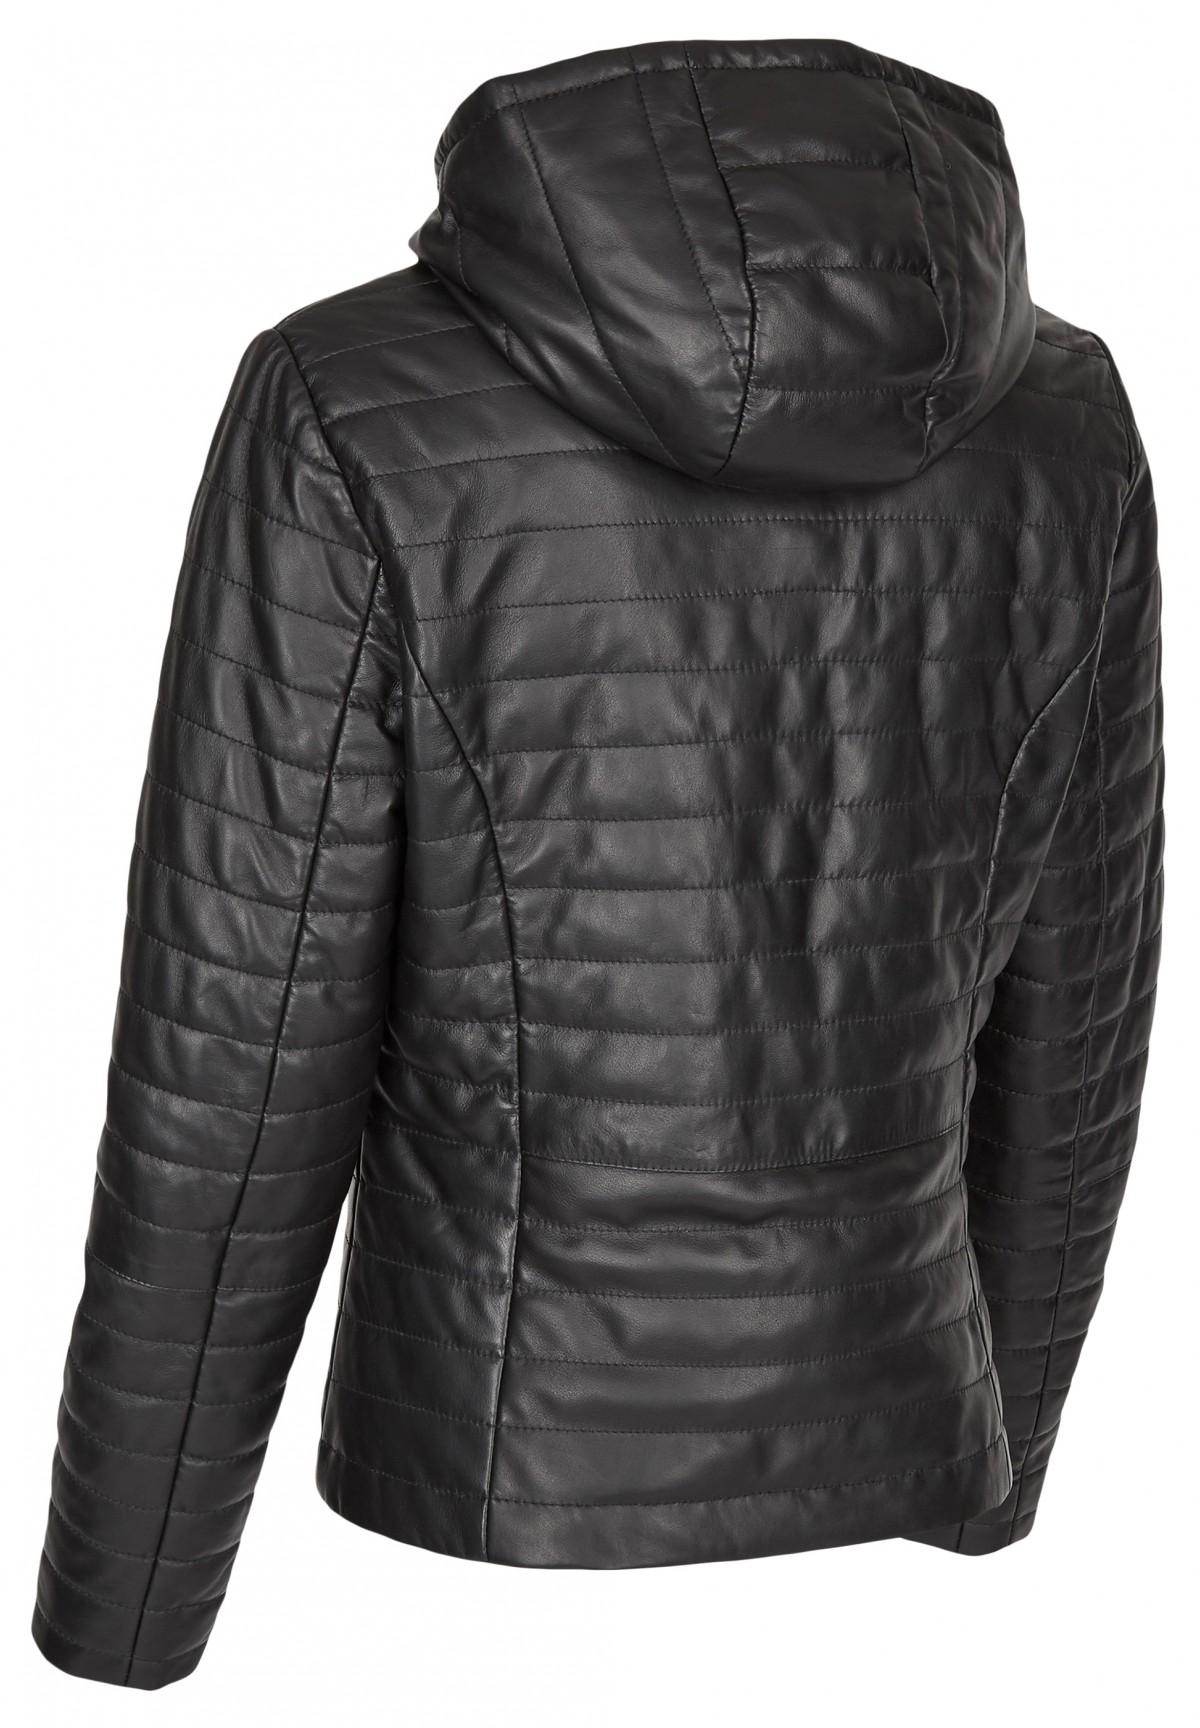 Lederjacke aus 100% Lammleder / Leather Jacket